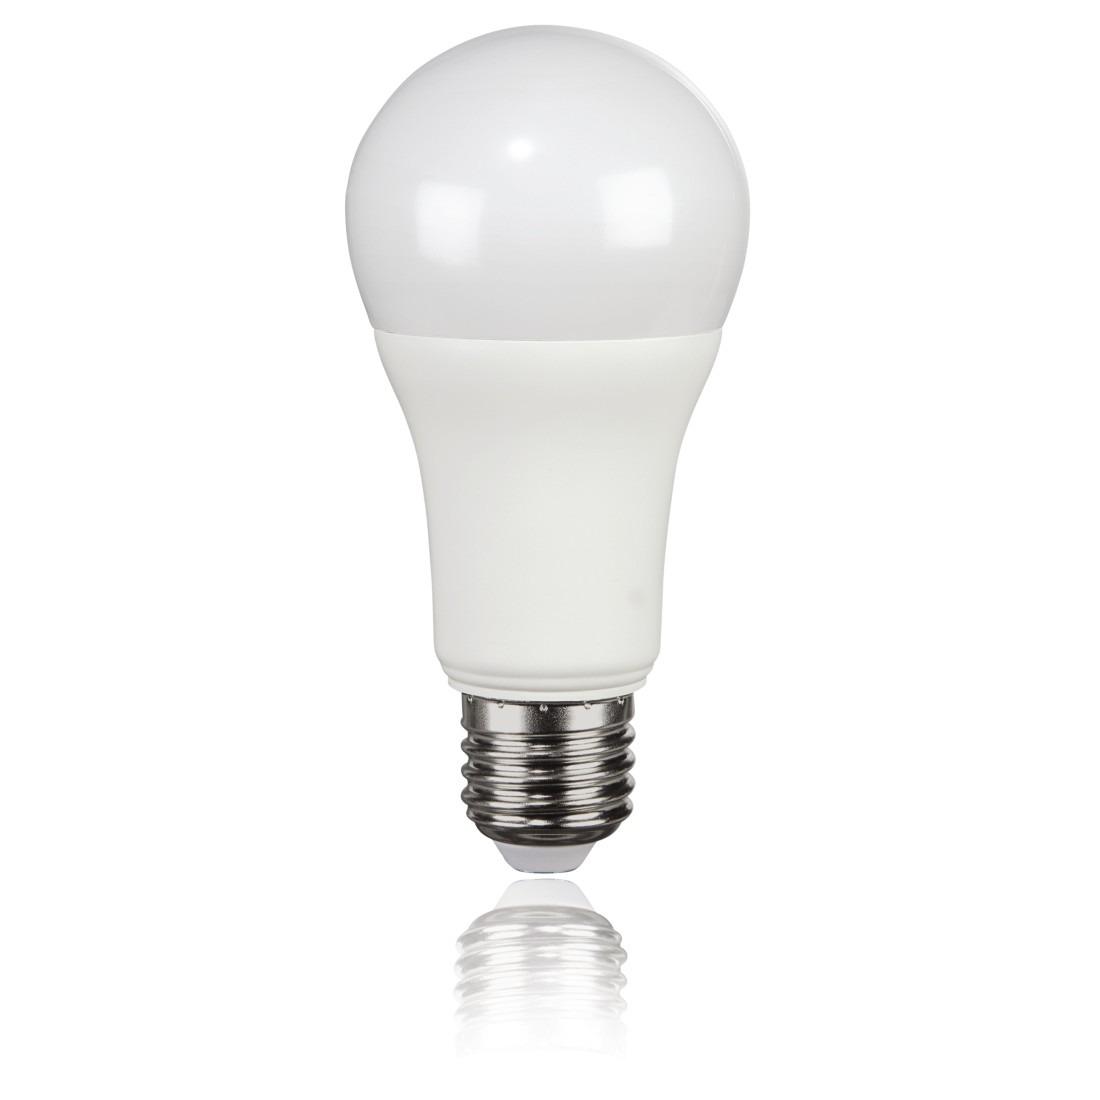 Korting Xavax Led lamp, E27, 1521lm vervangt 100W gloeilamp